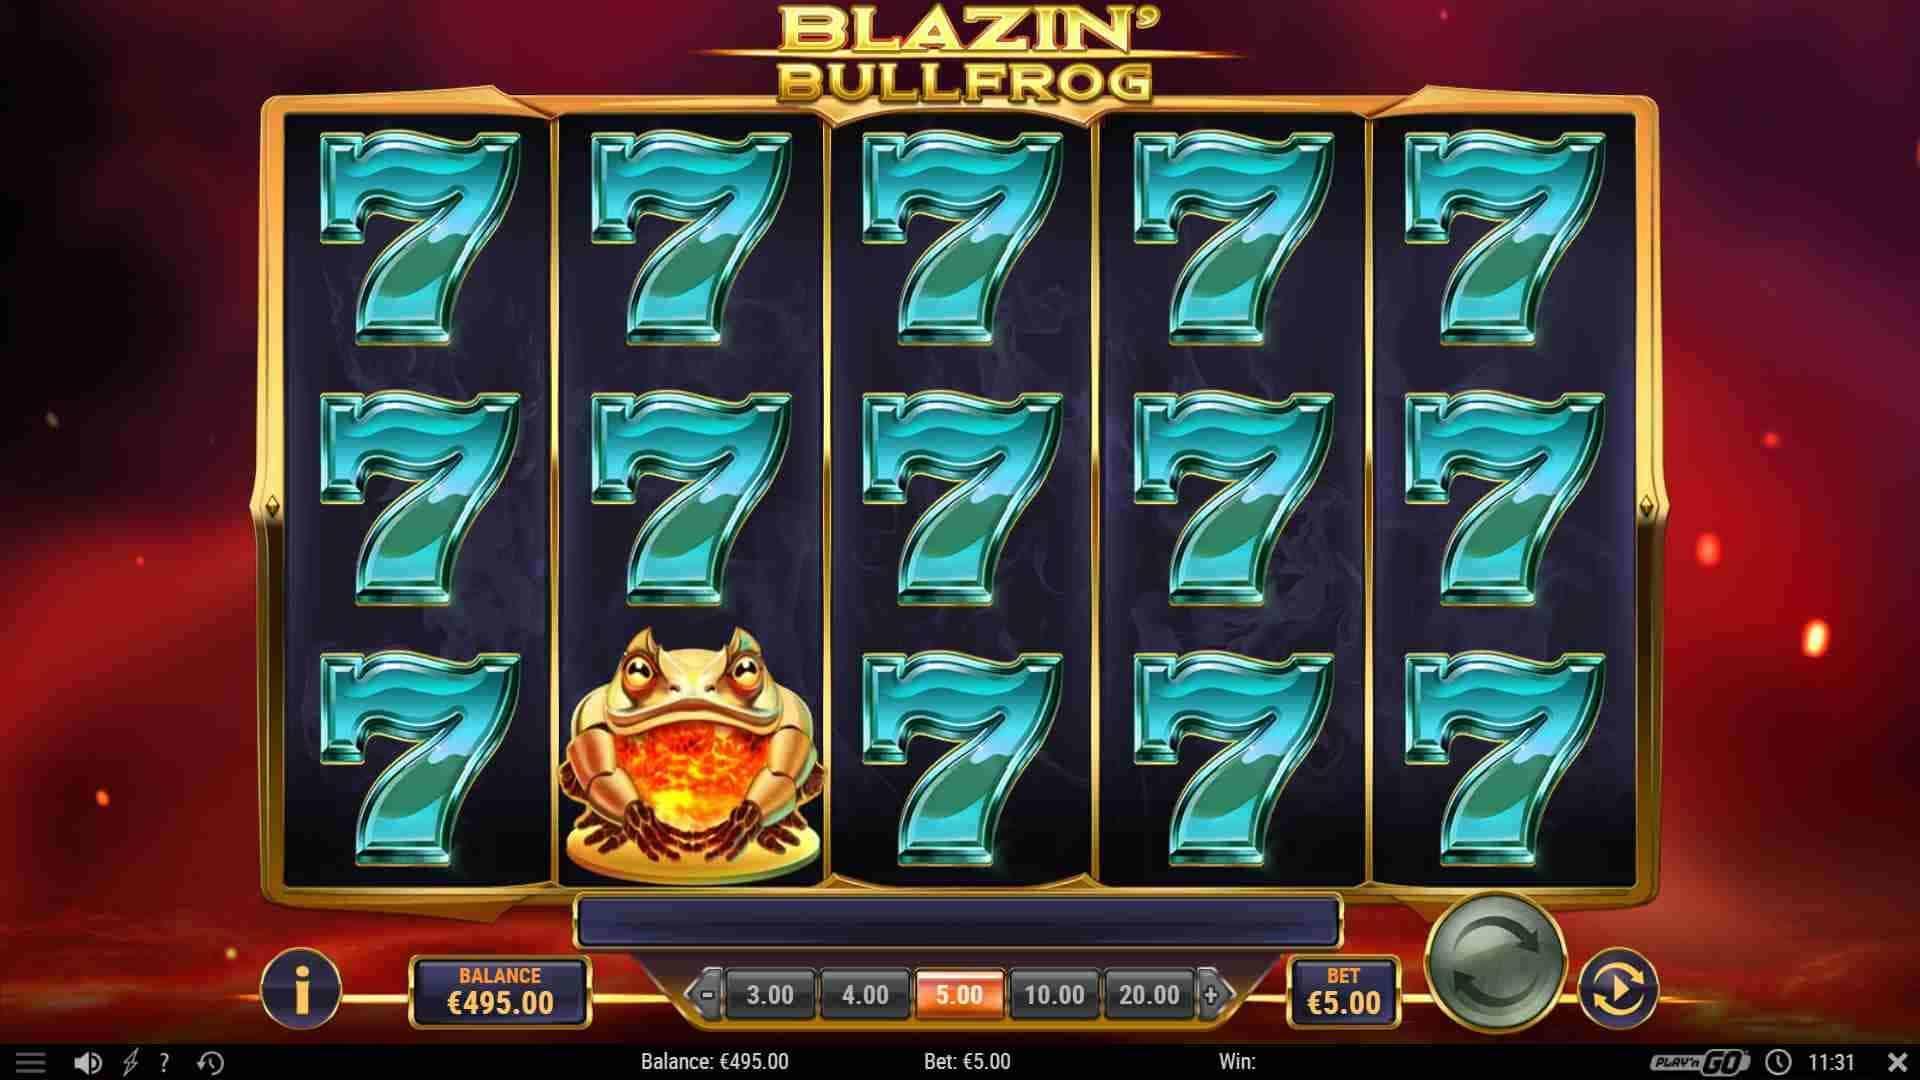 Blazin' Bullfrog Base Game